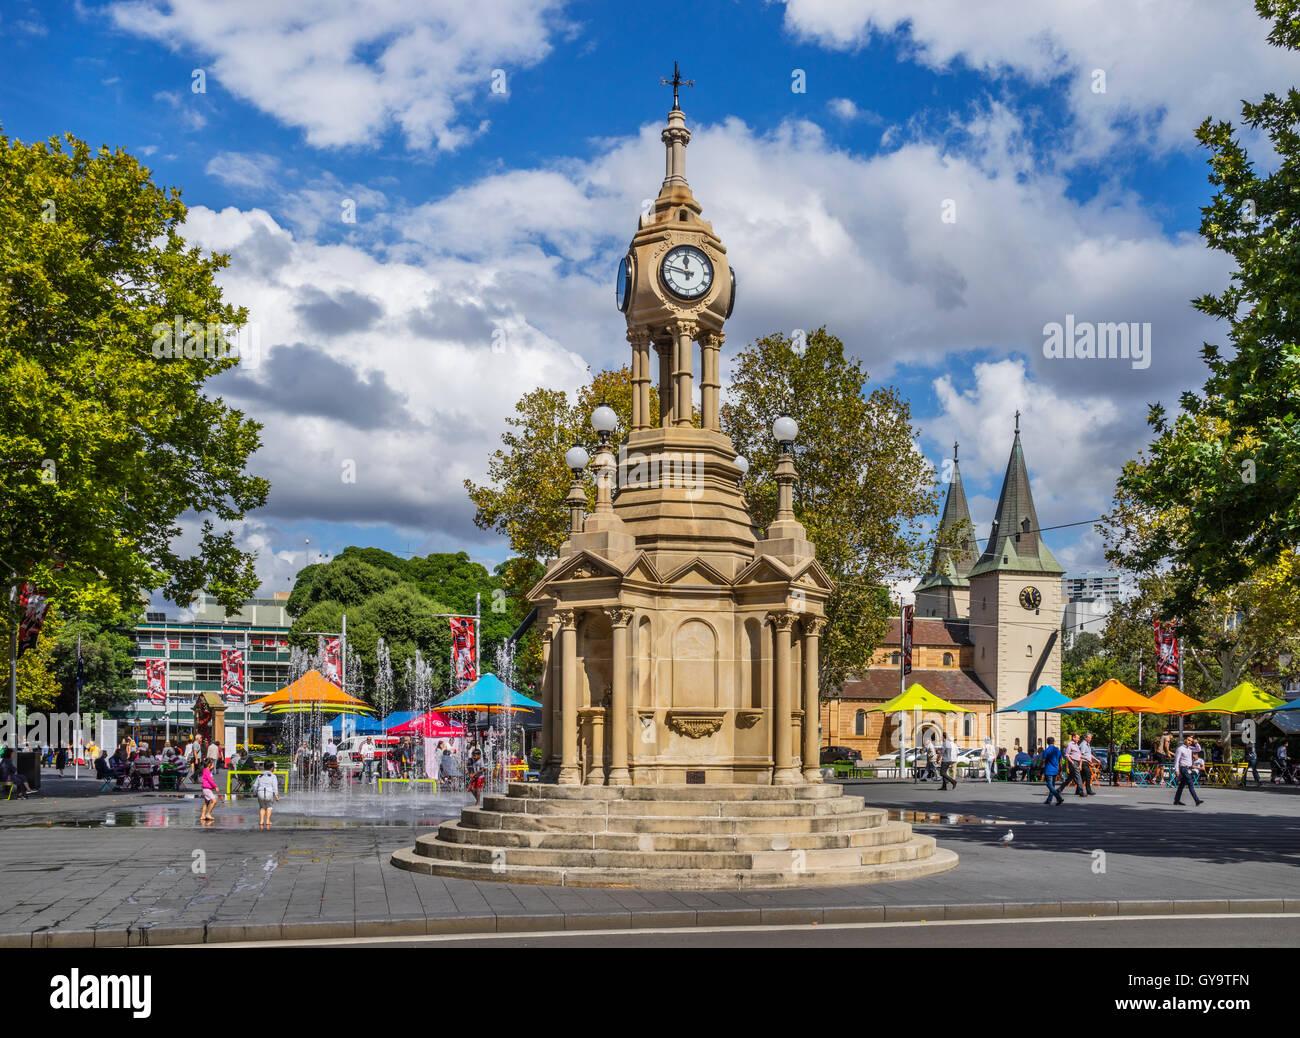 Australia, New South Wales, Greater Western Sydney, Parramatta Centennial Memorial Clock and fountain, Church Street - Stock Image